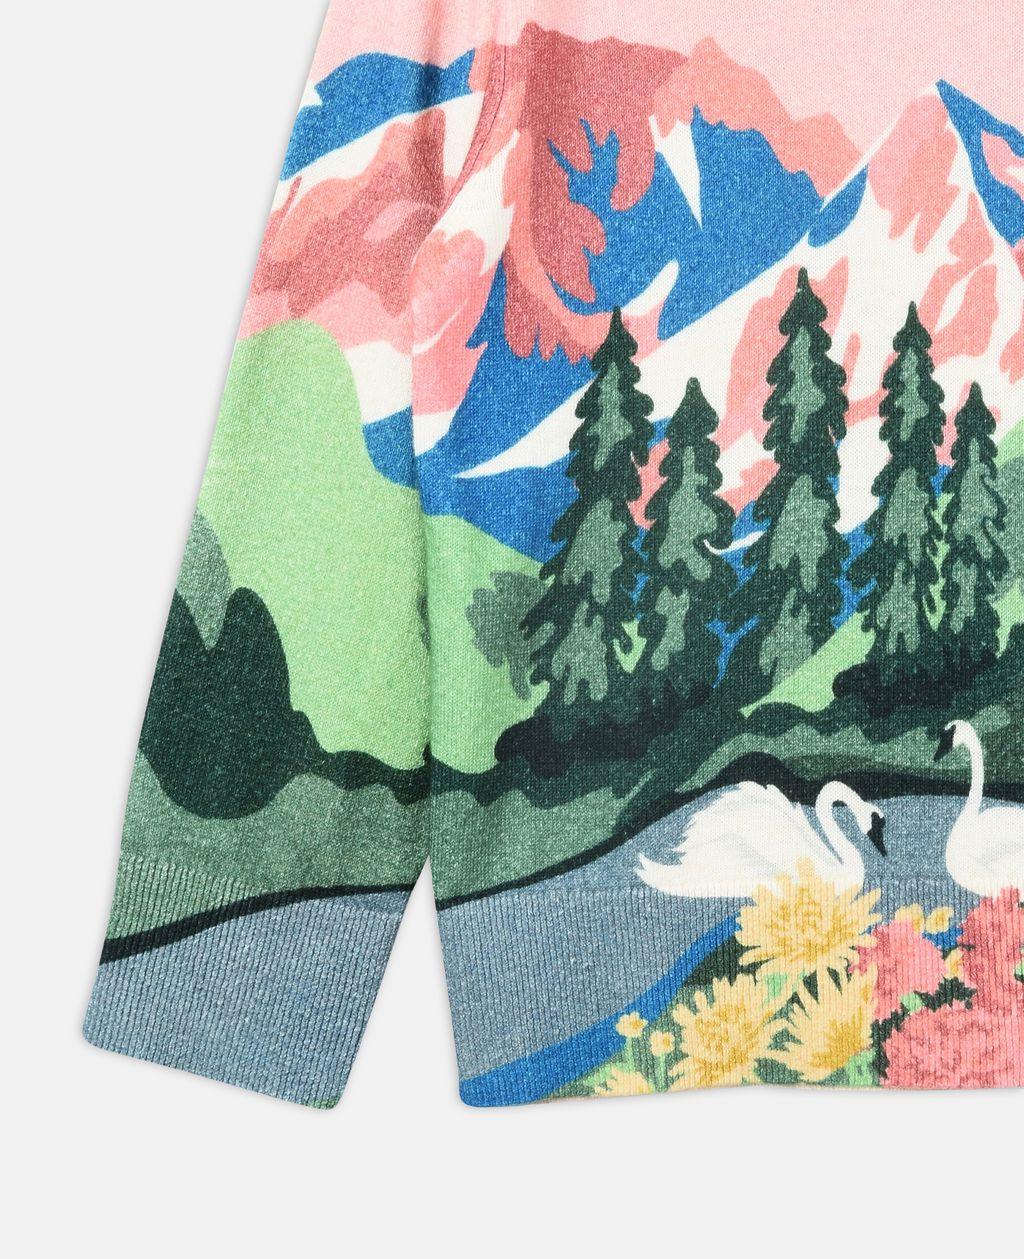 Cassius Pink Mountain Print Knit Sweater - STELLA MCCARTNEY KIDS